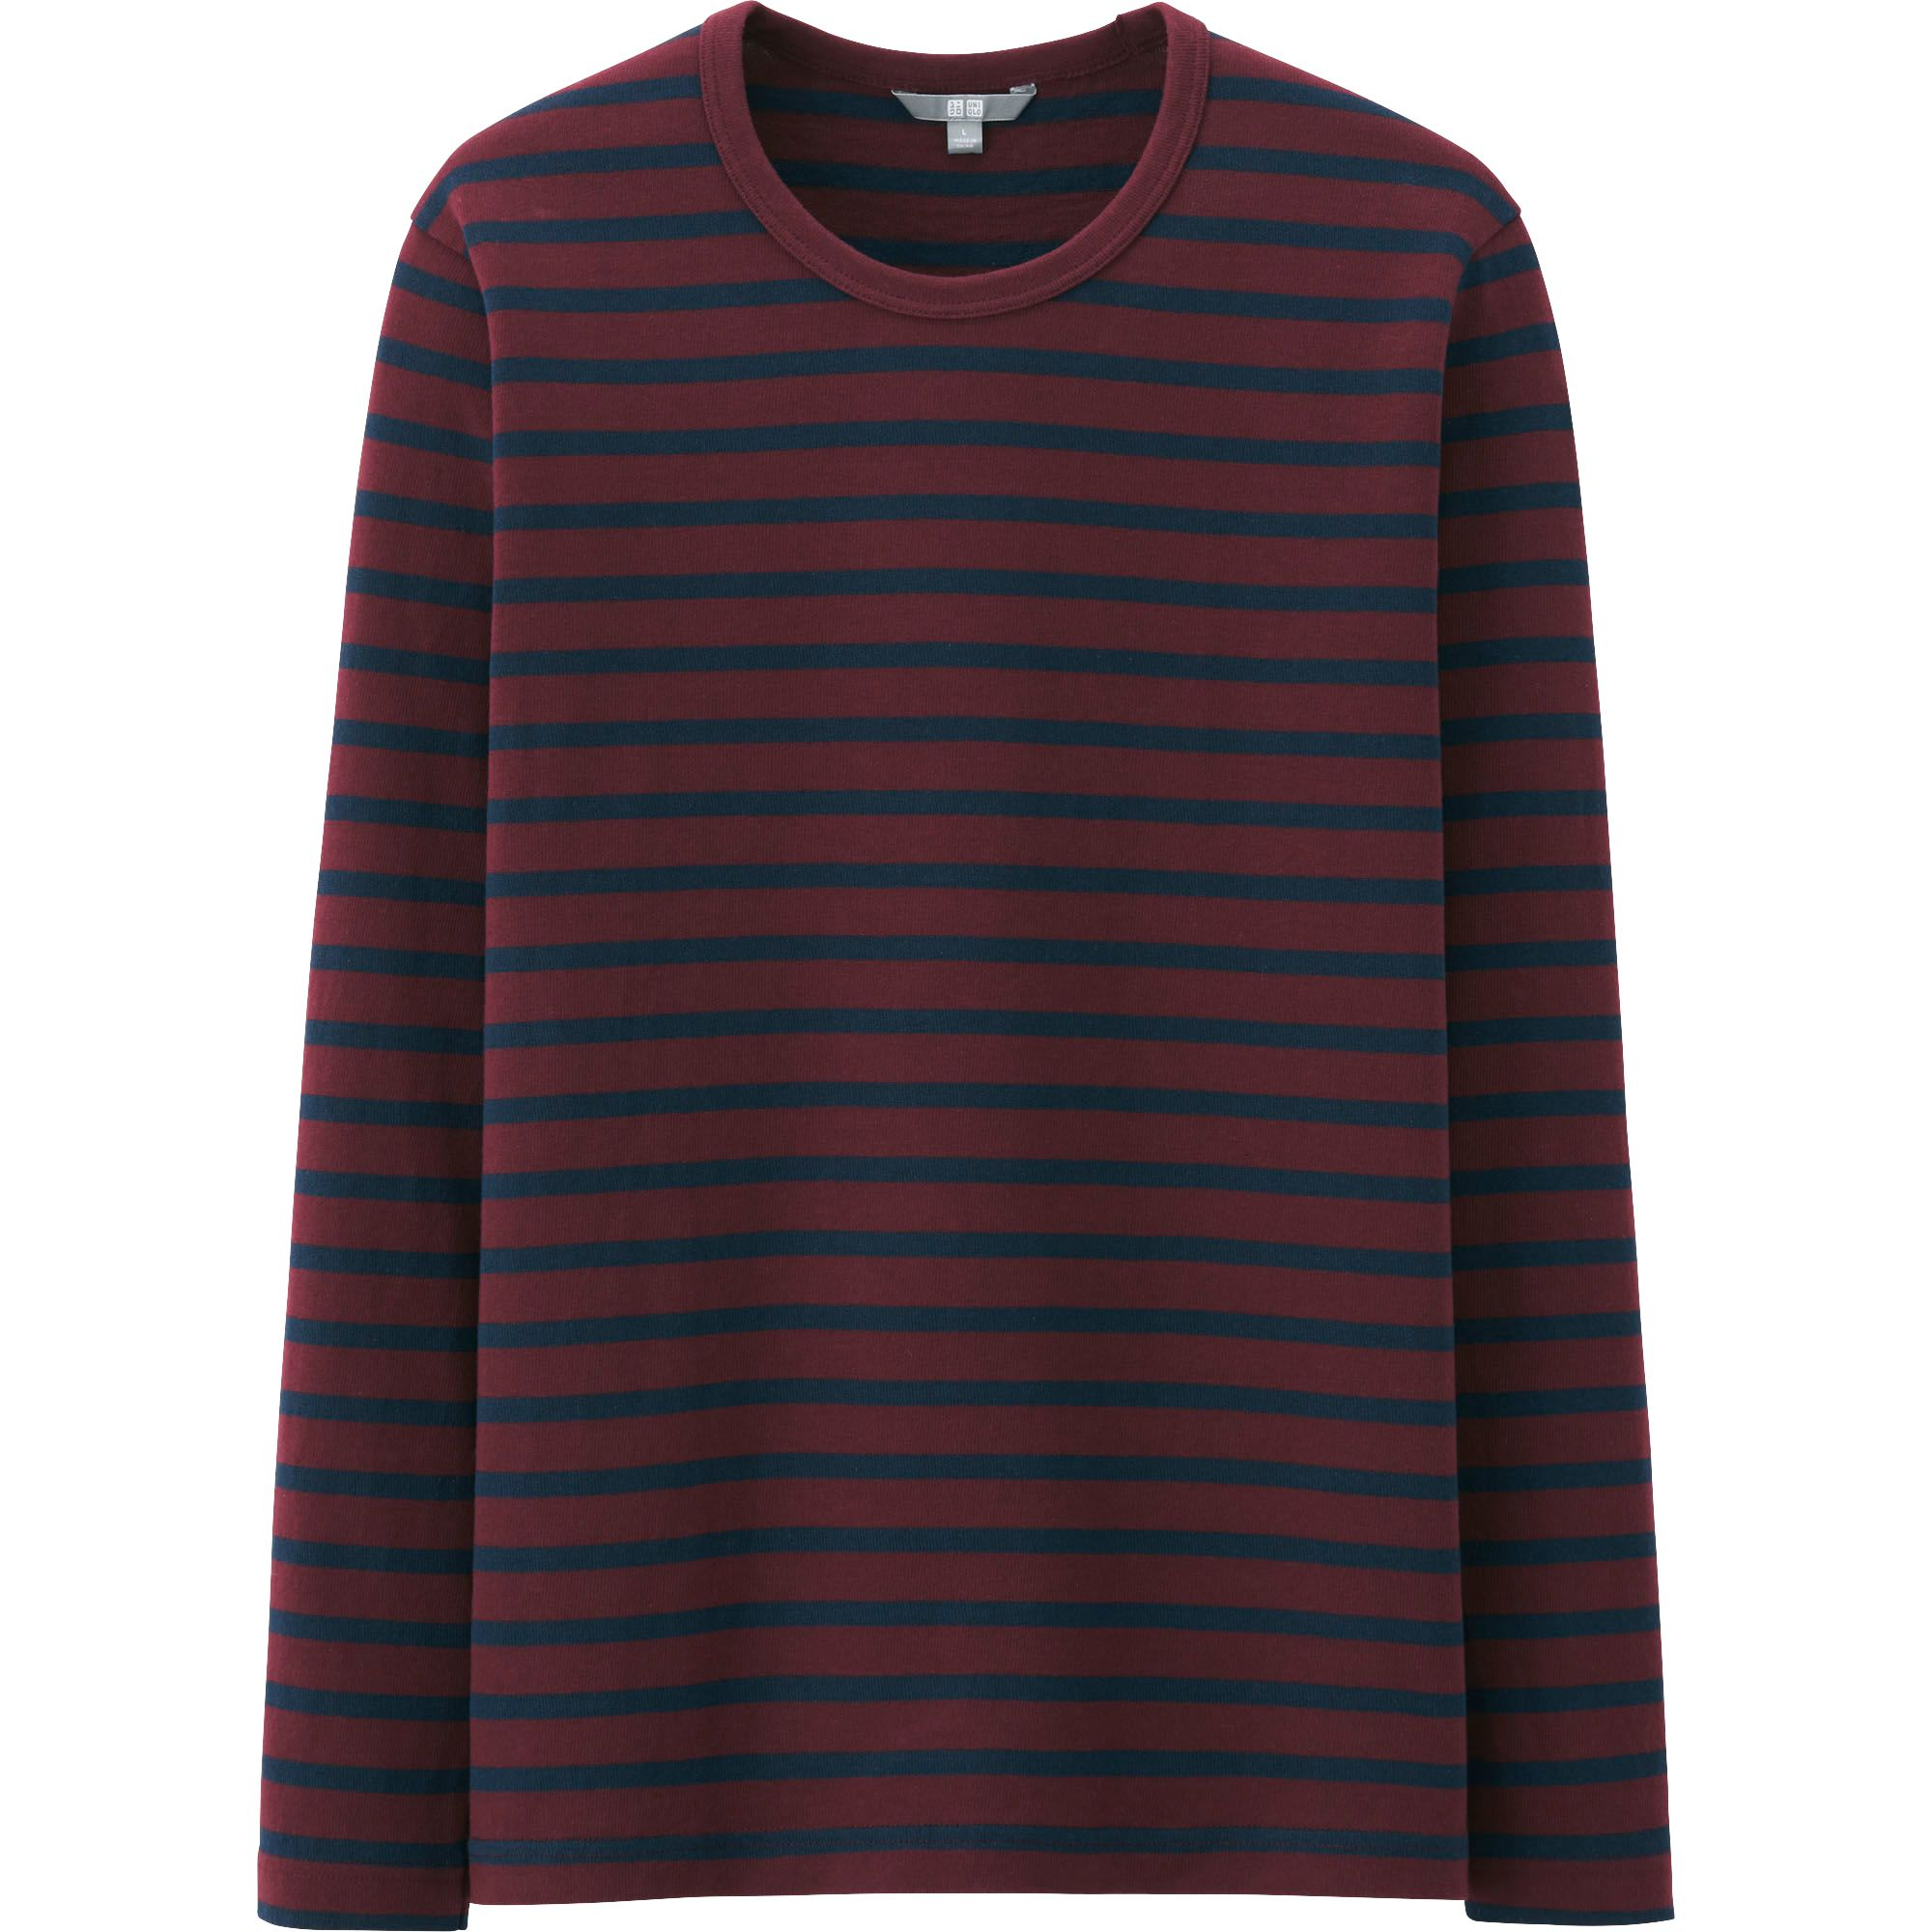 Uniqlo men washed striped crew neck long sleeve t shirt in for Mens striped long sleeve t shirt